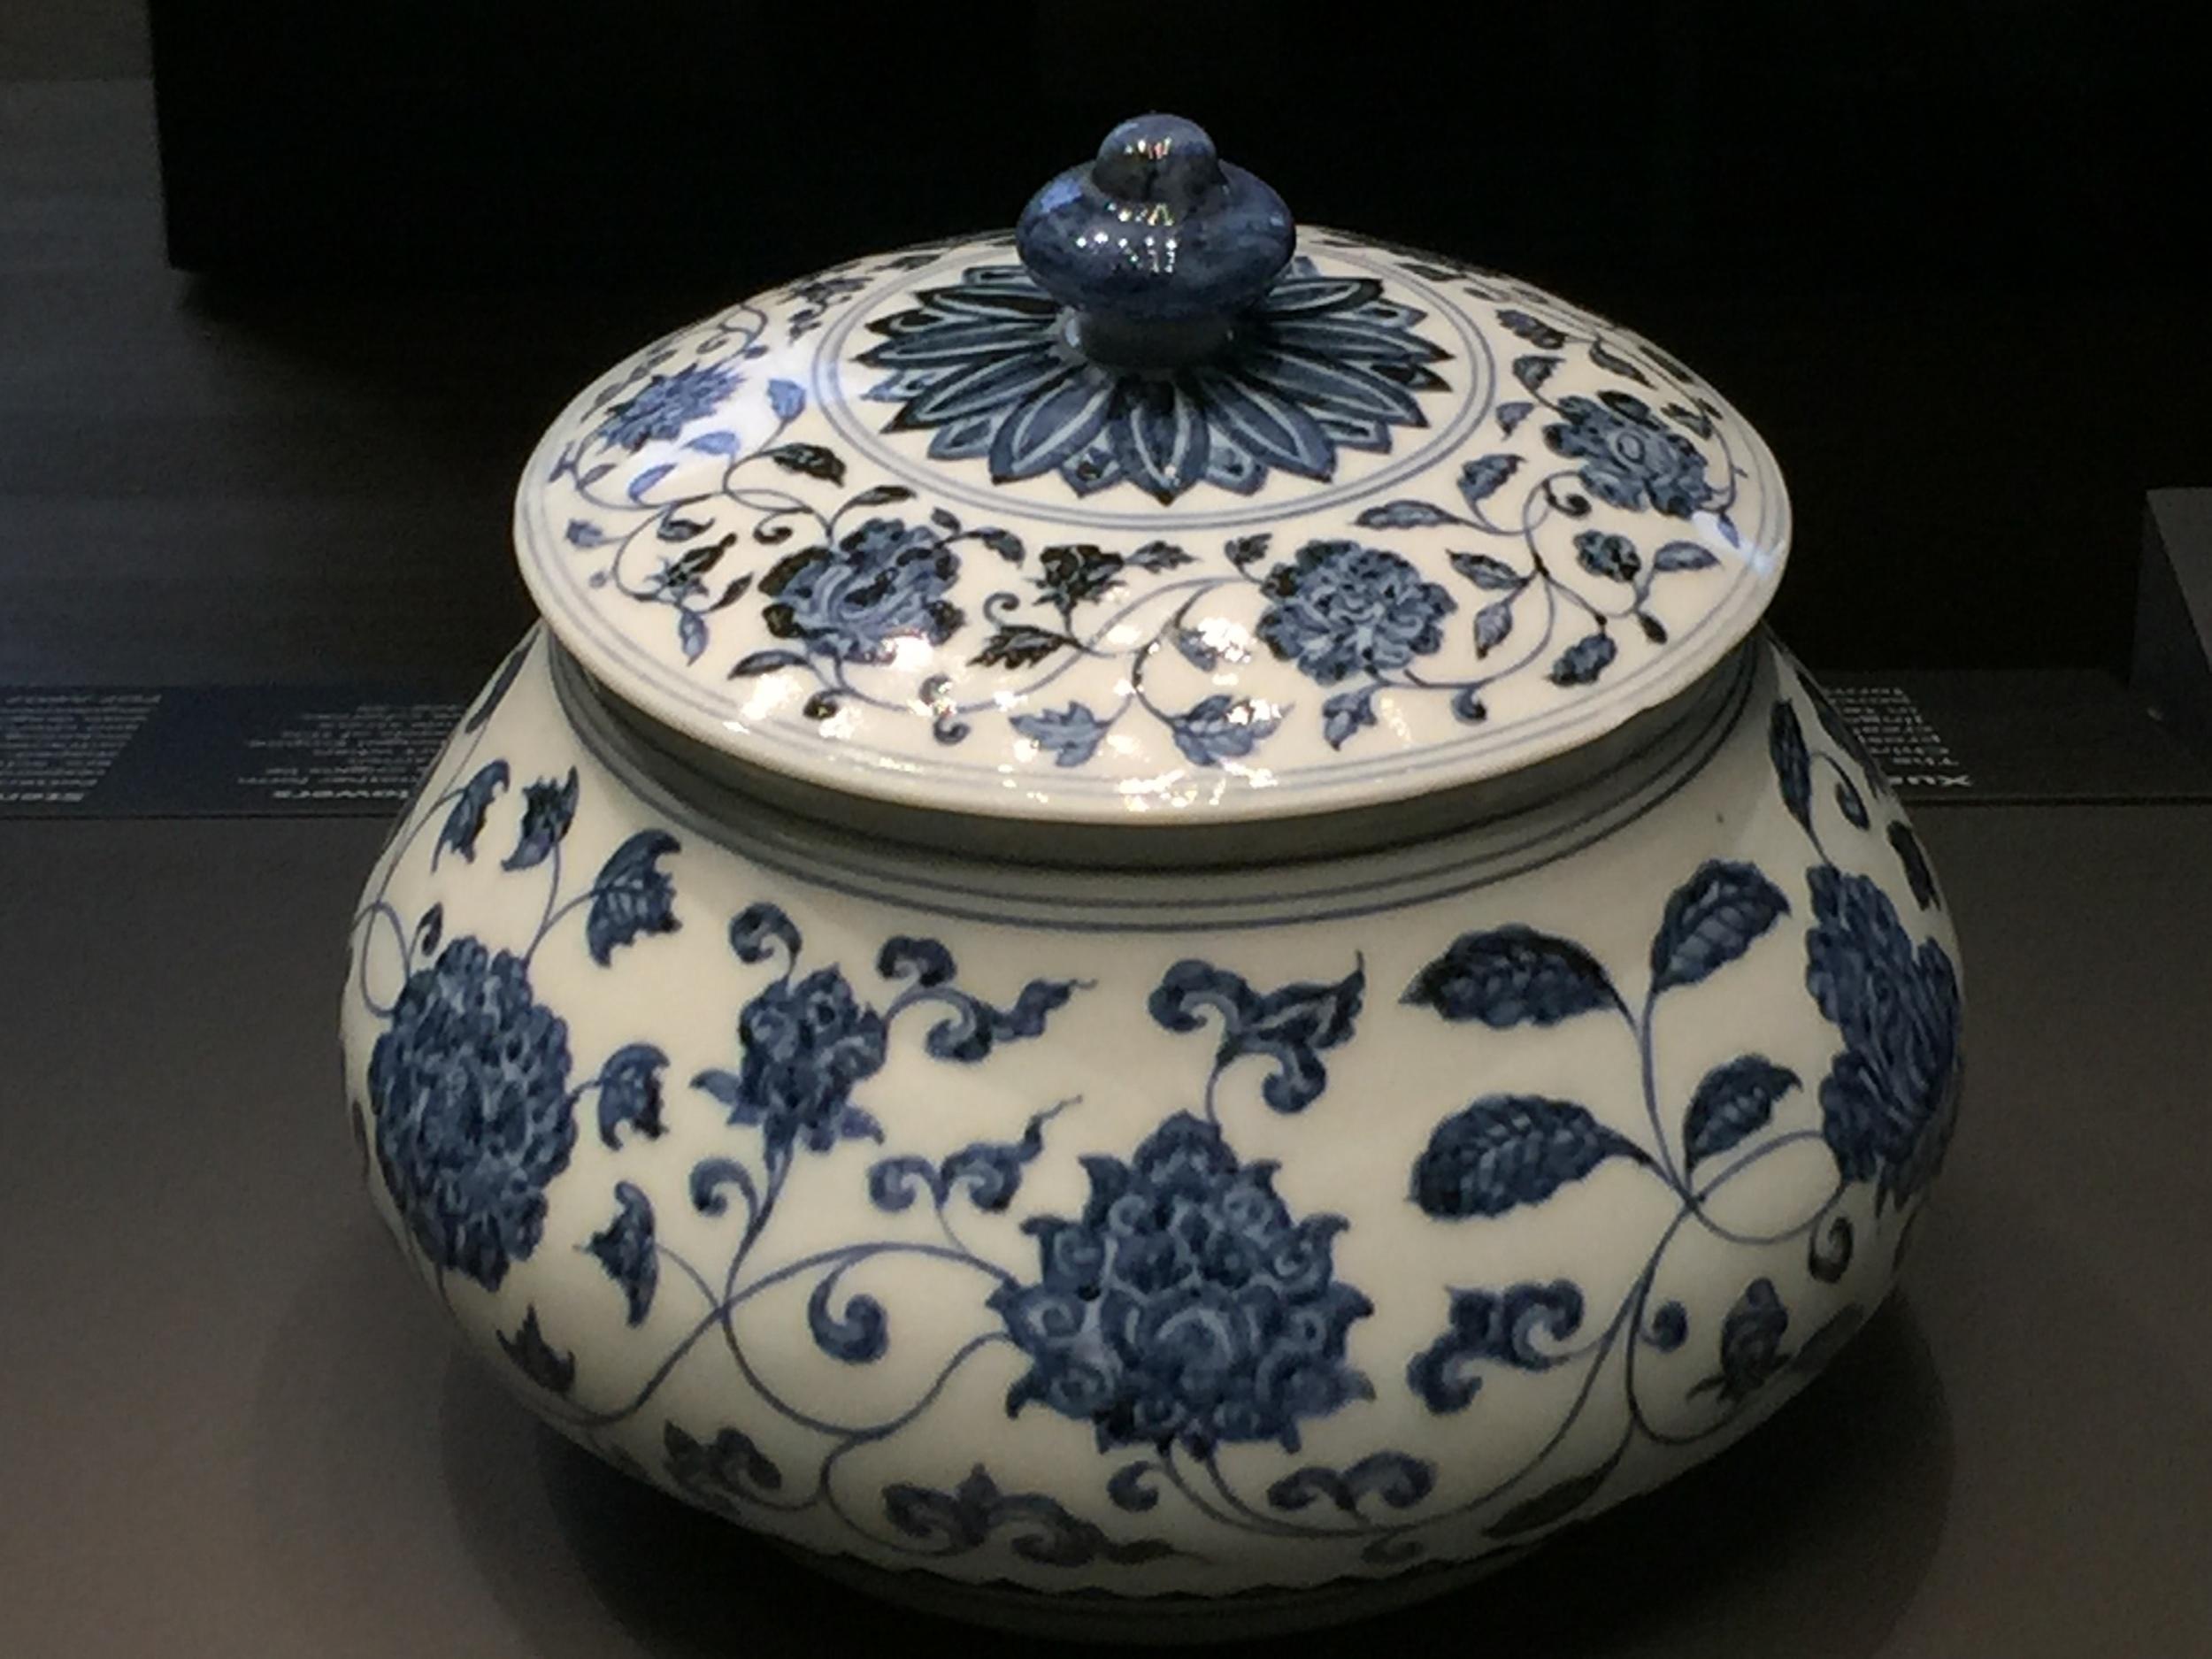 Chinese-Porcelain-British-Museum-Percival-David-jessewaugh.com-61.jpg